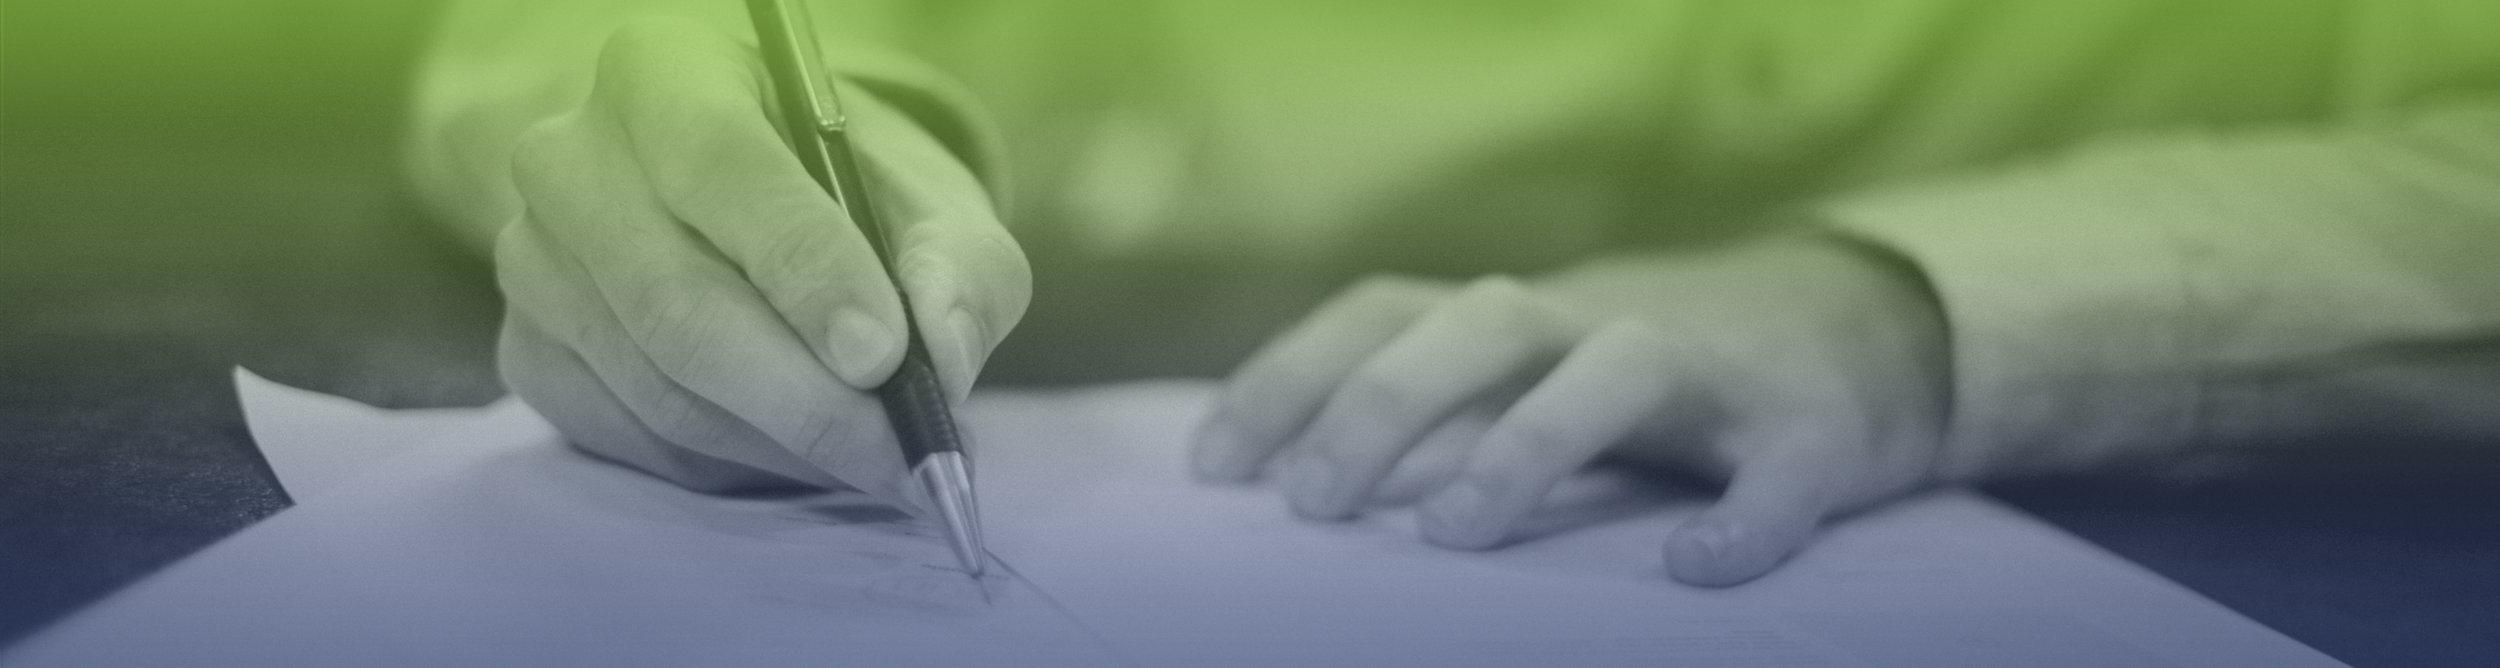 cochrane-paperwork-image.jpg